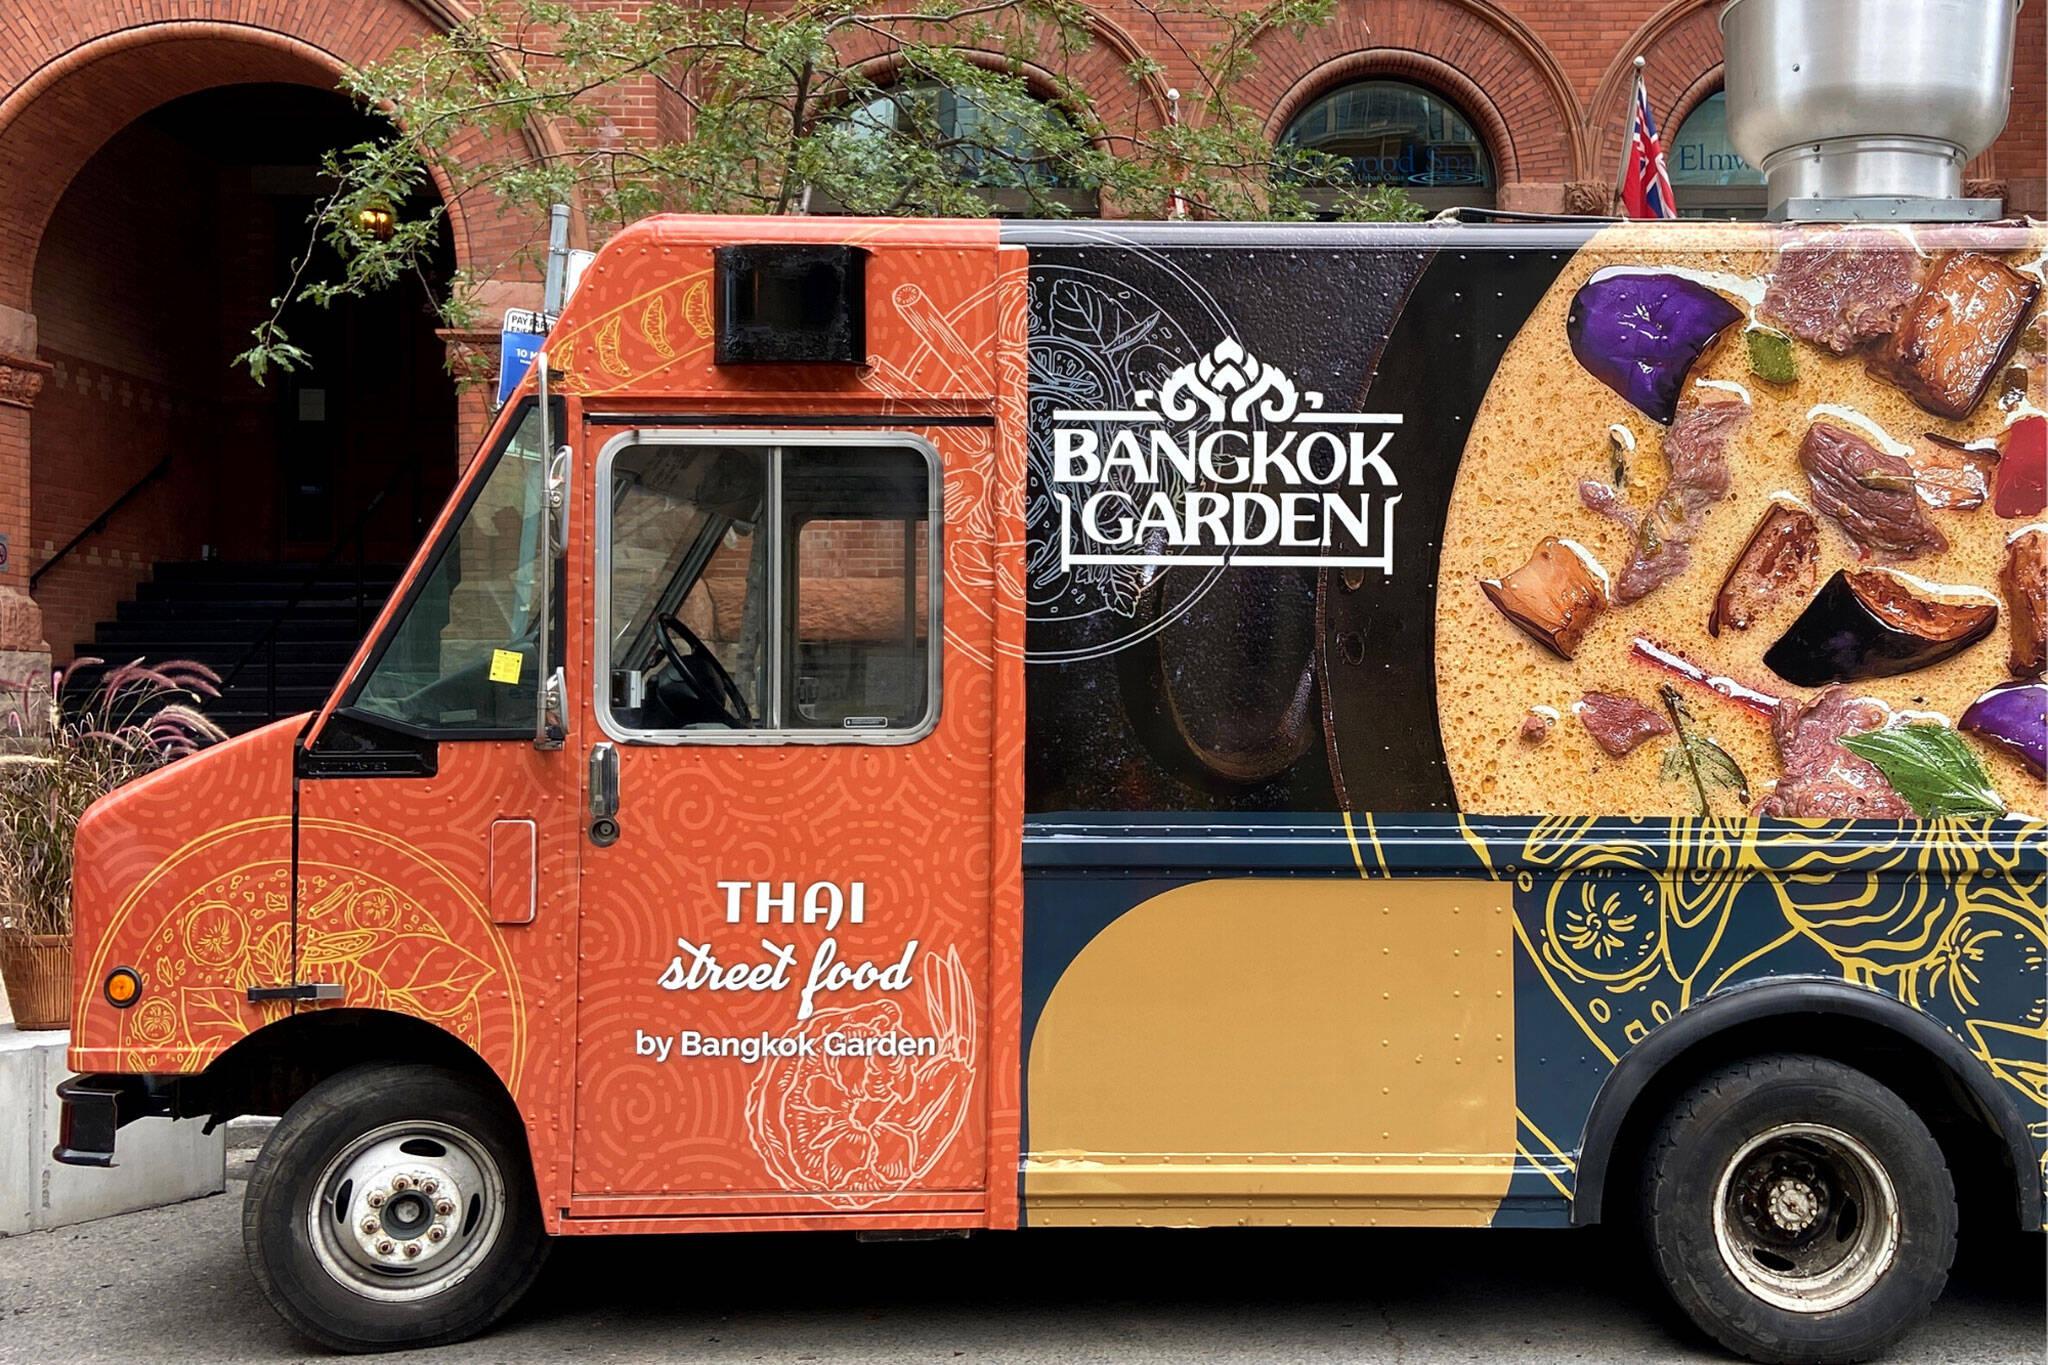 bangkok garden food truck